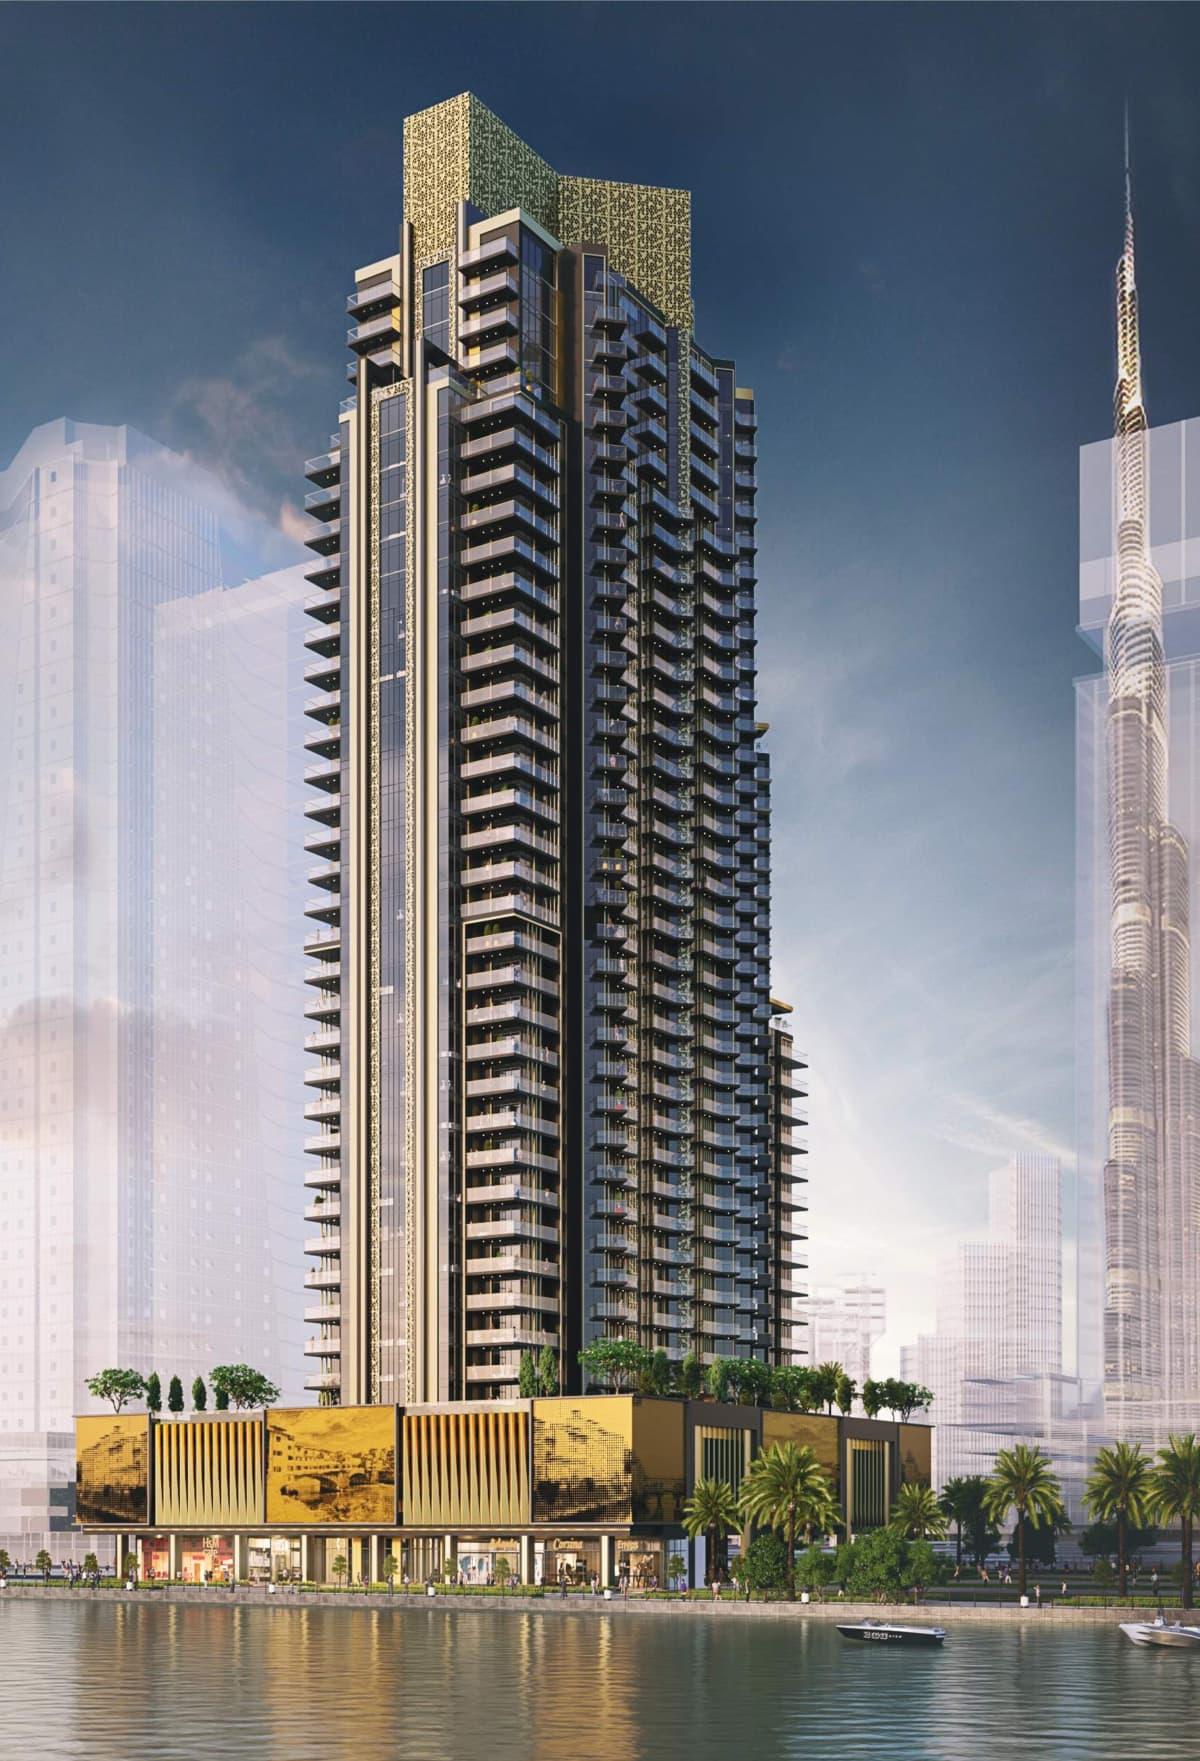 Middle East Construction Projects Uae, Saudi Arabia, Kuwait